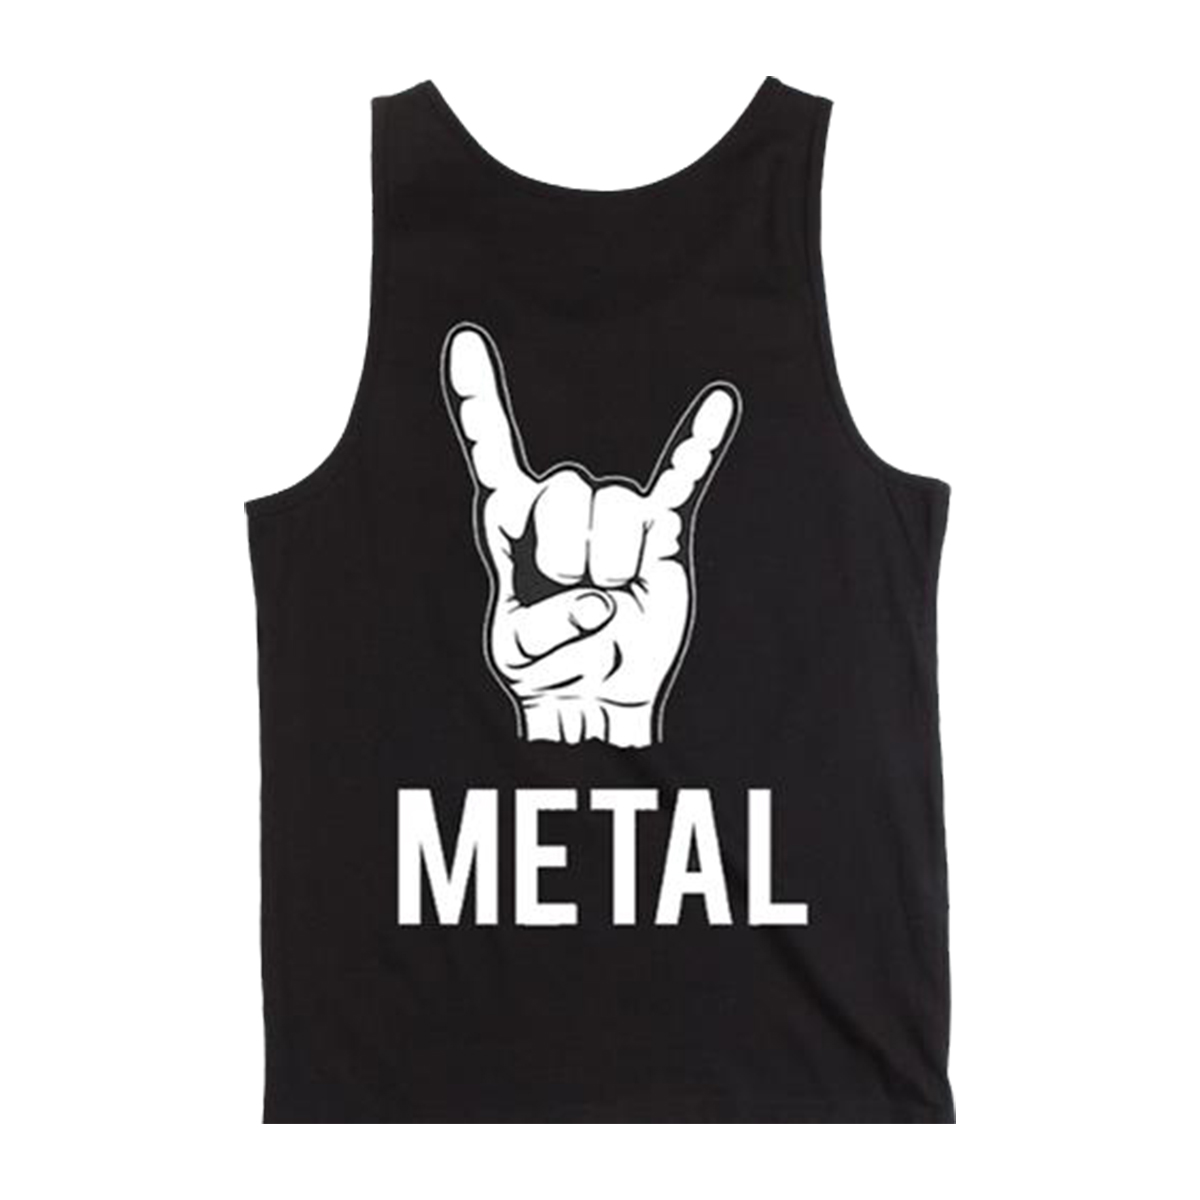 (Horns) Metal - Black Tank Top